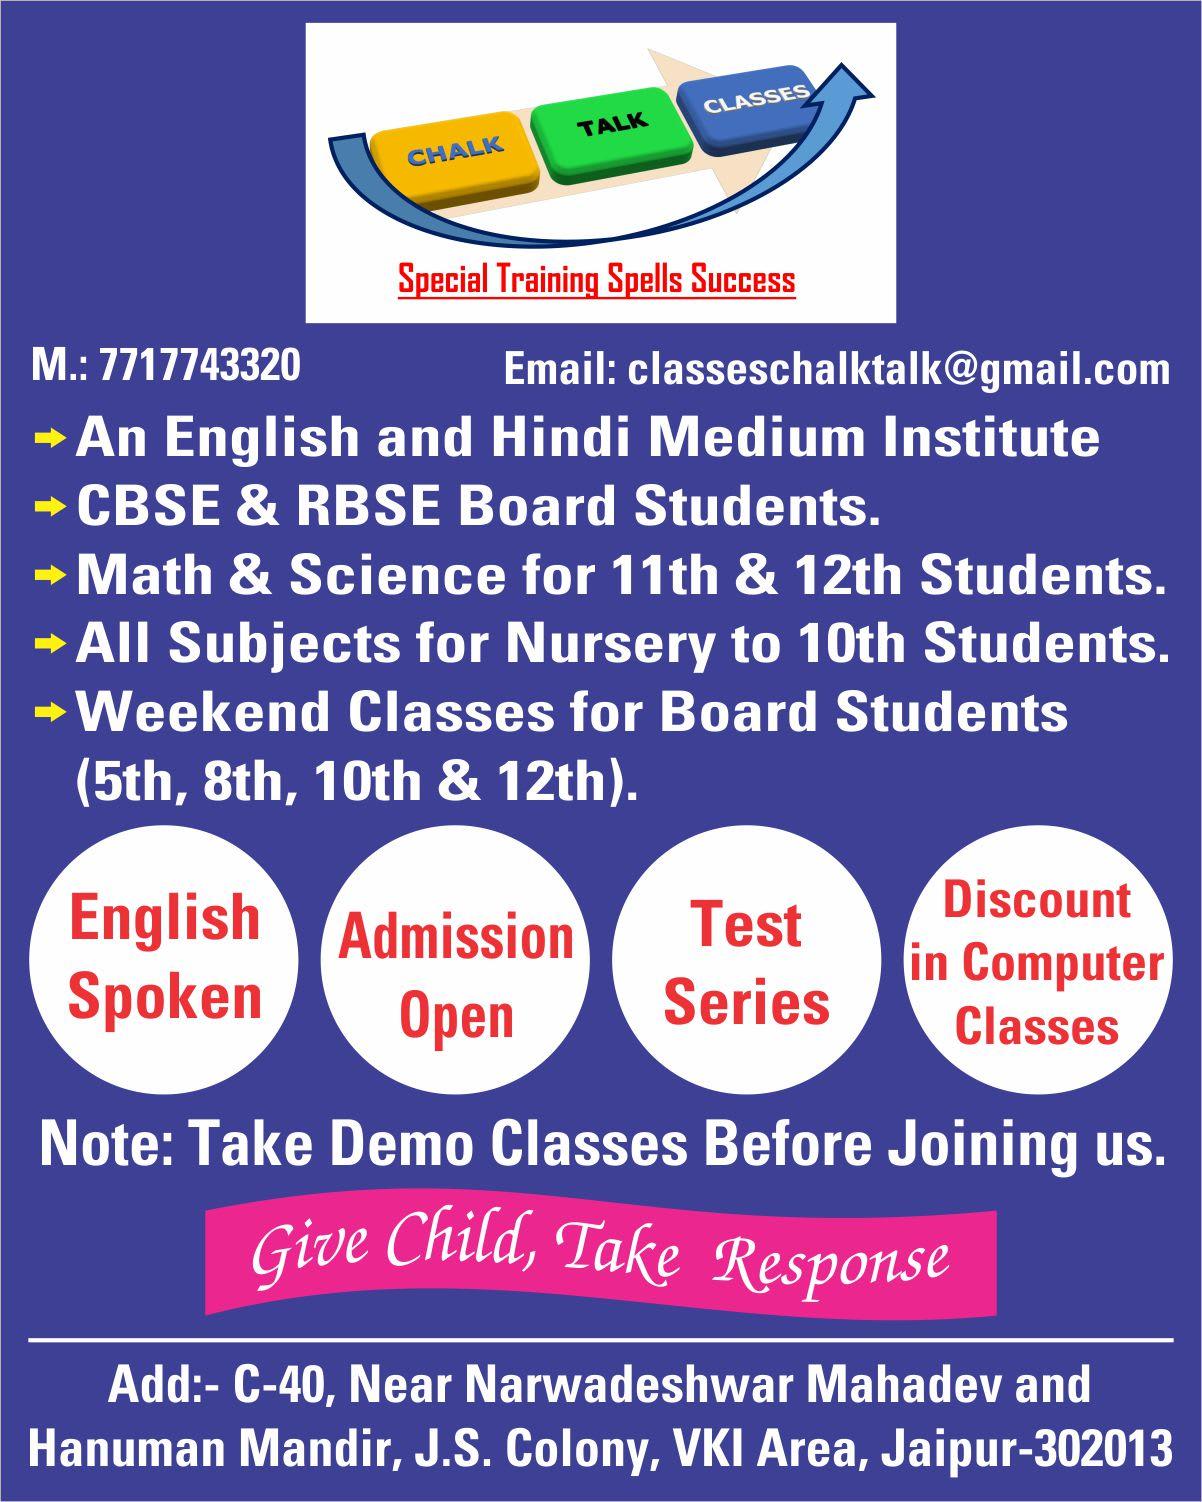 Chalk-Talk Classes | Training Course Provider